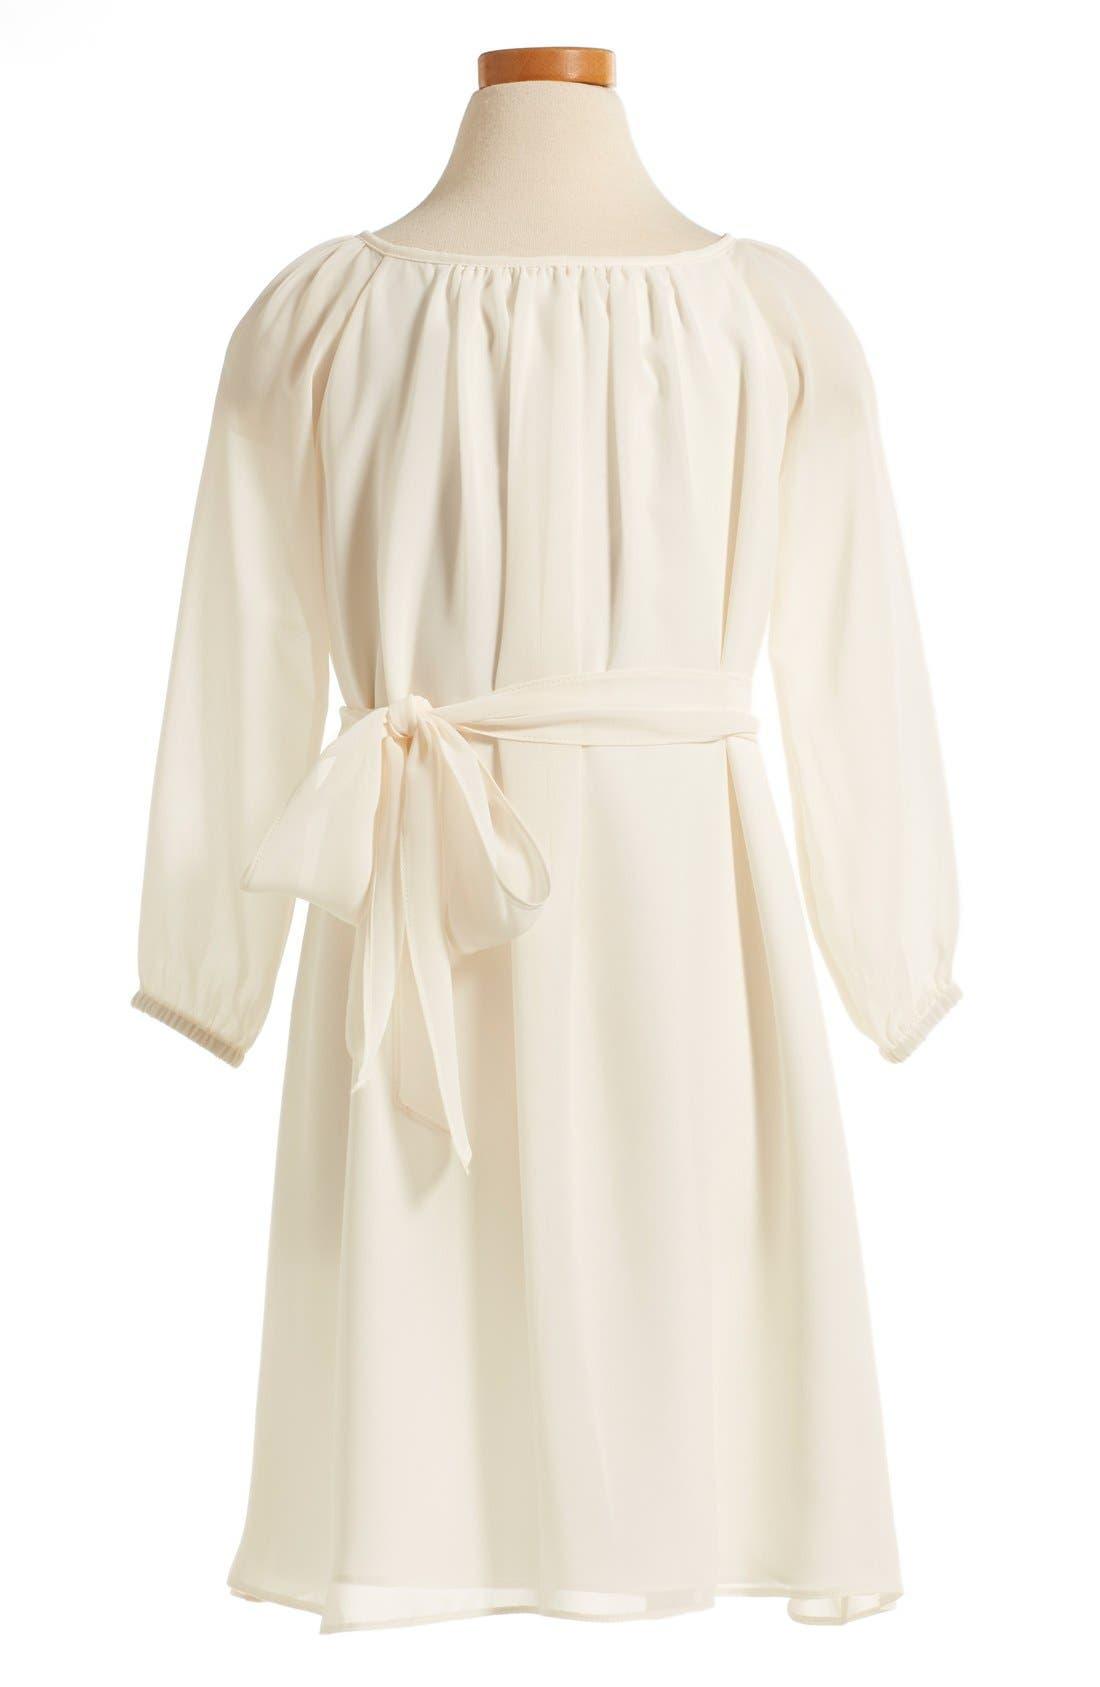 Long Sleeve Chiffon Midi Dress,                             Alternate thumbnail 2, color,                             902